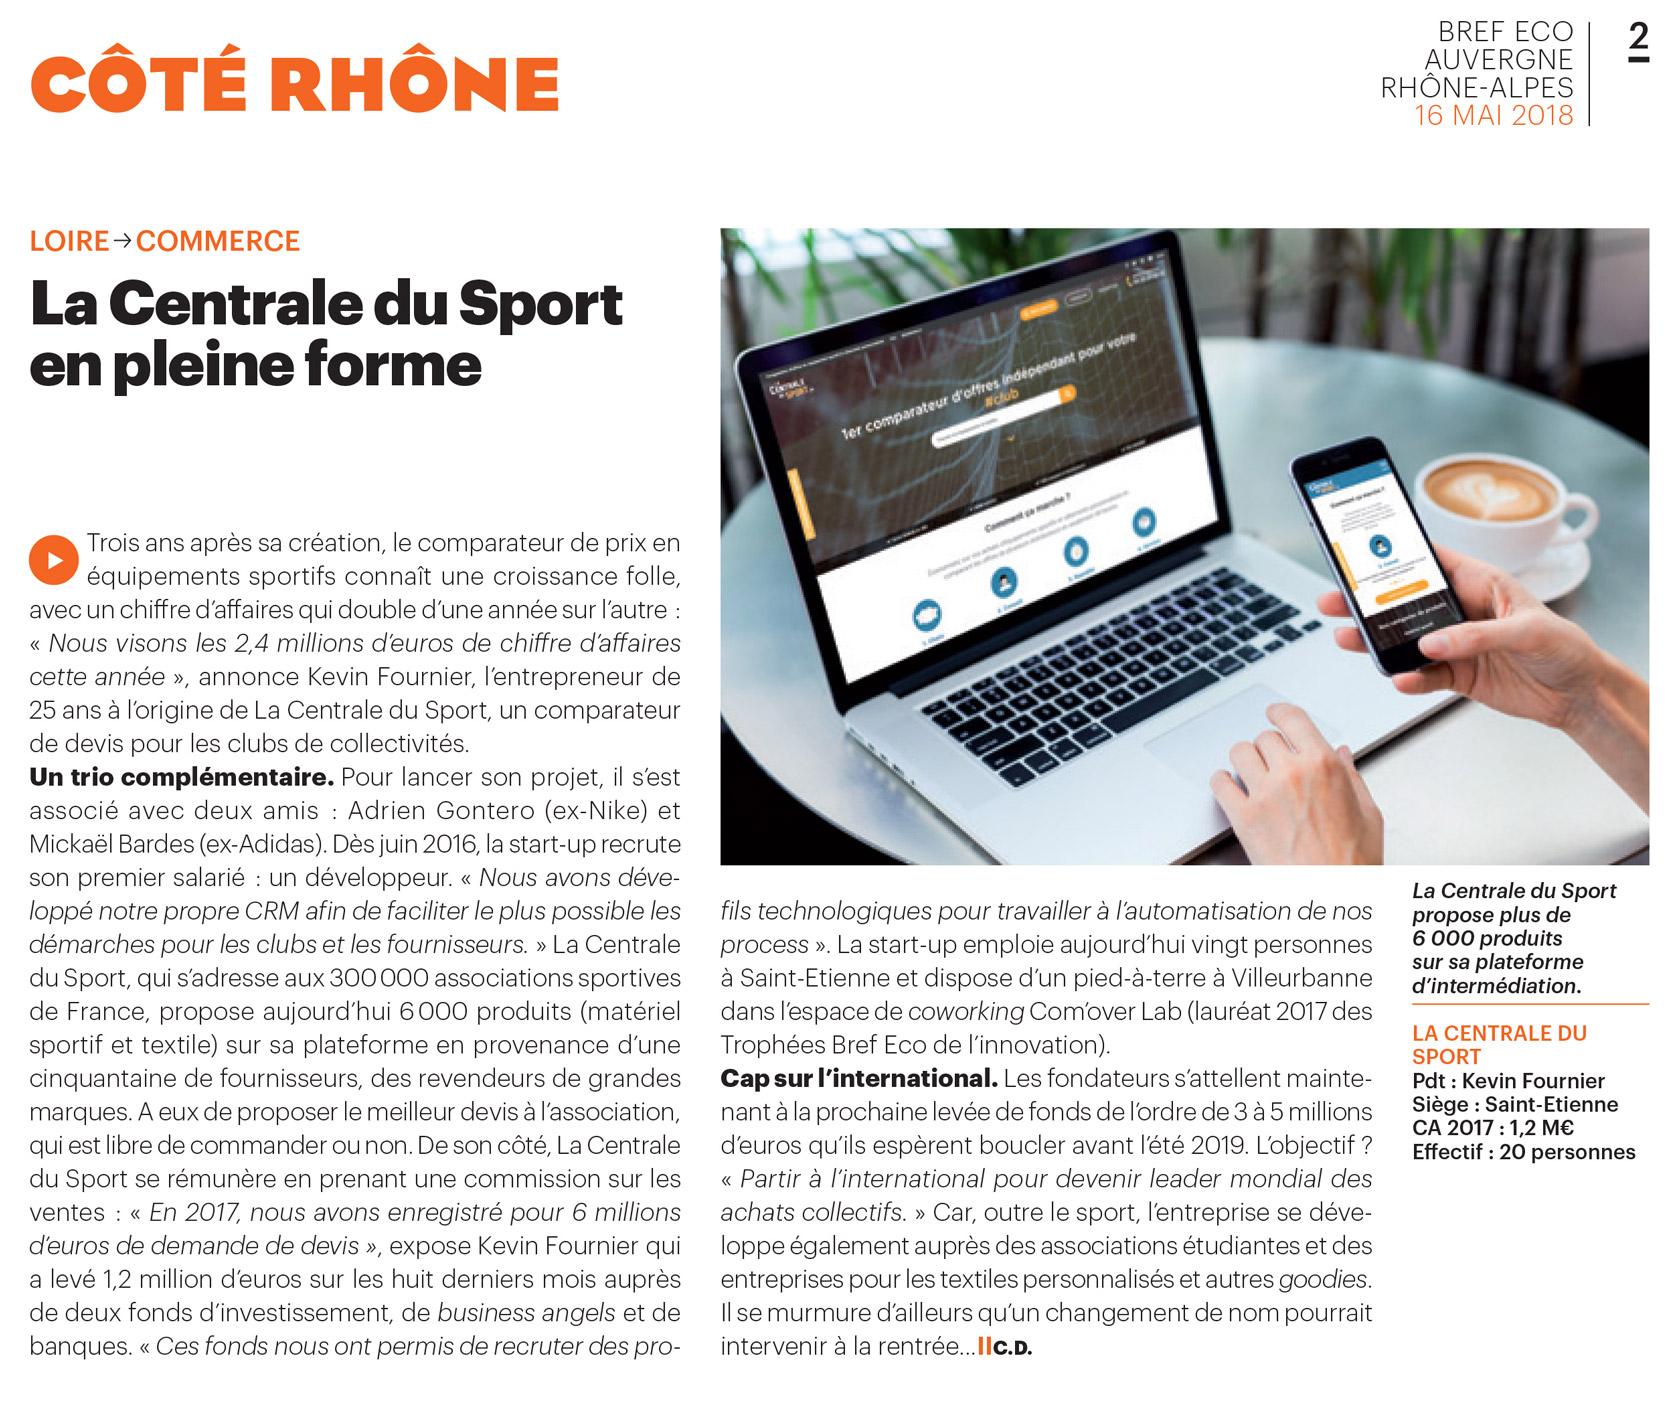 Article-bref eco-la-centrale-du-sport